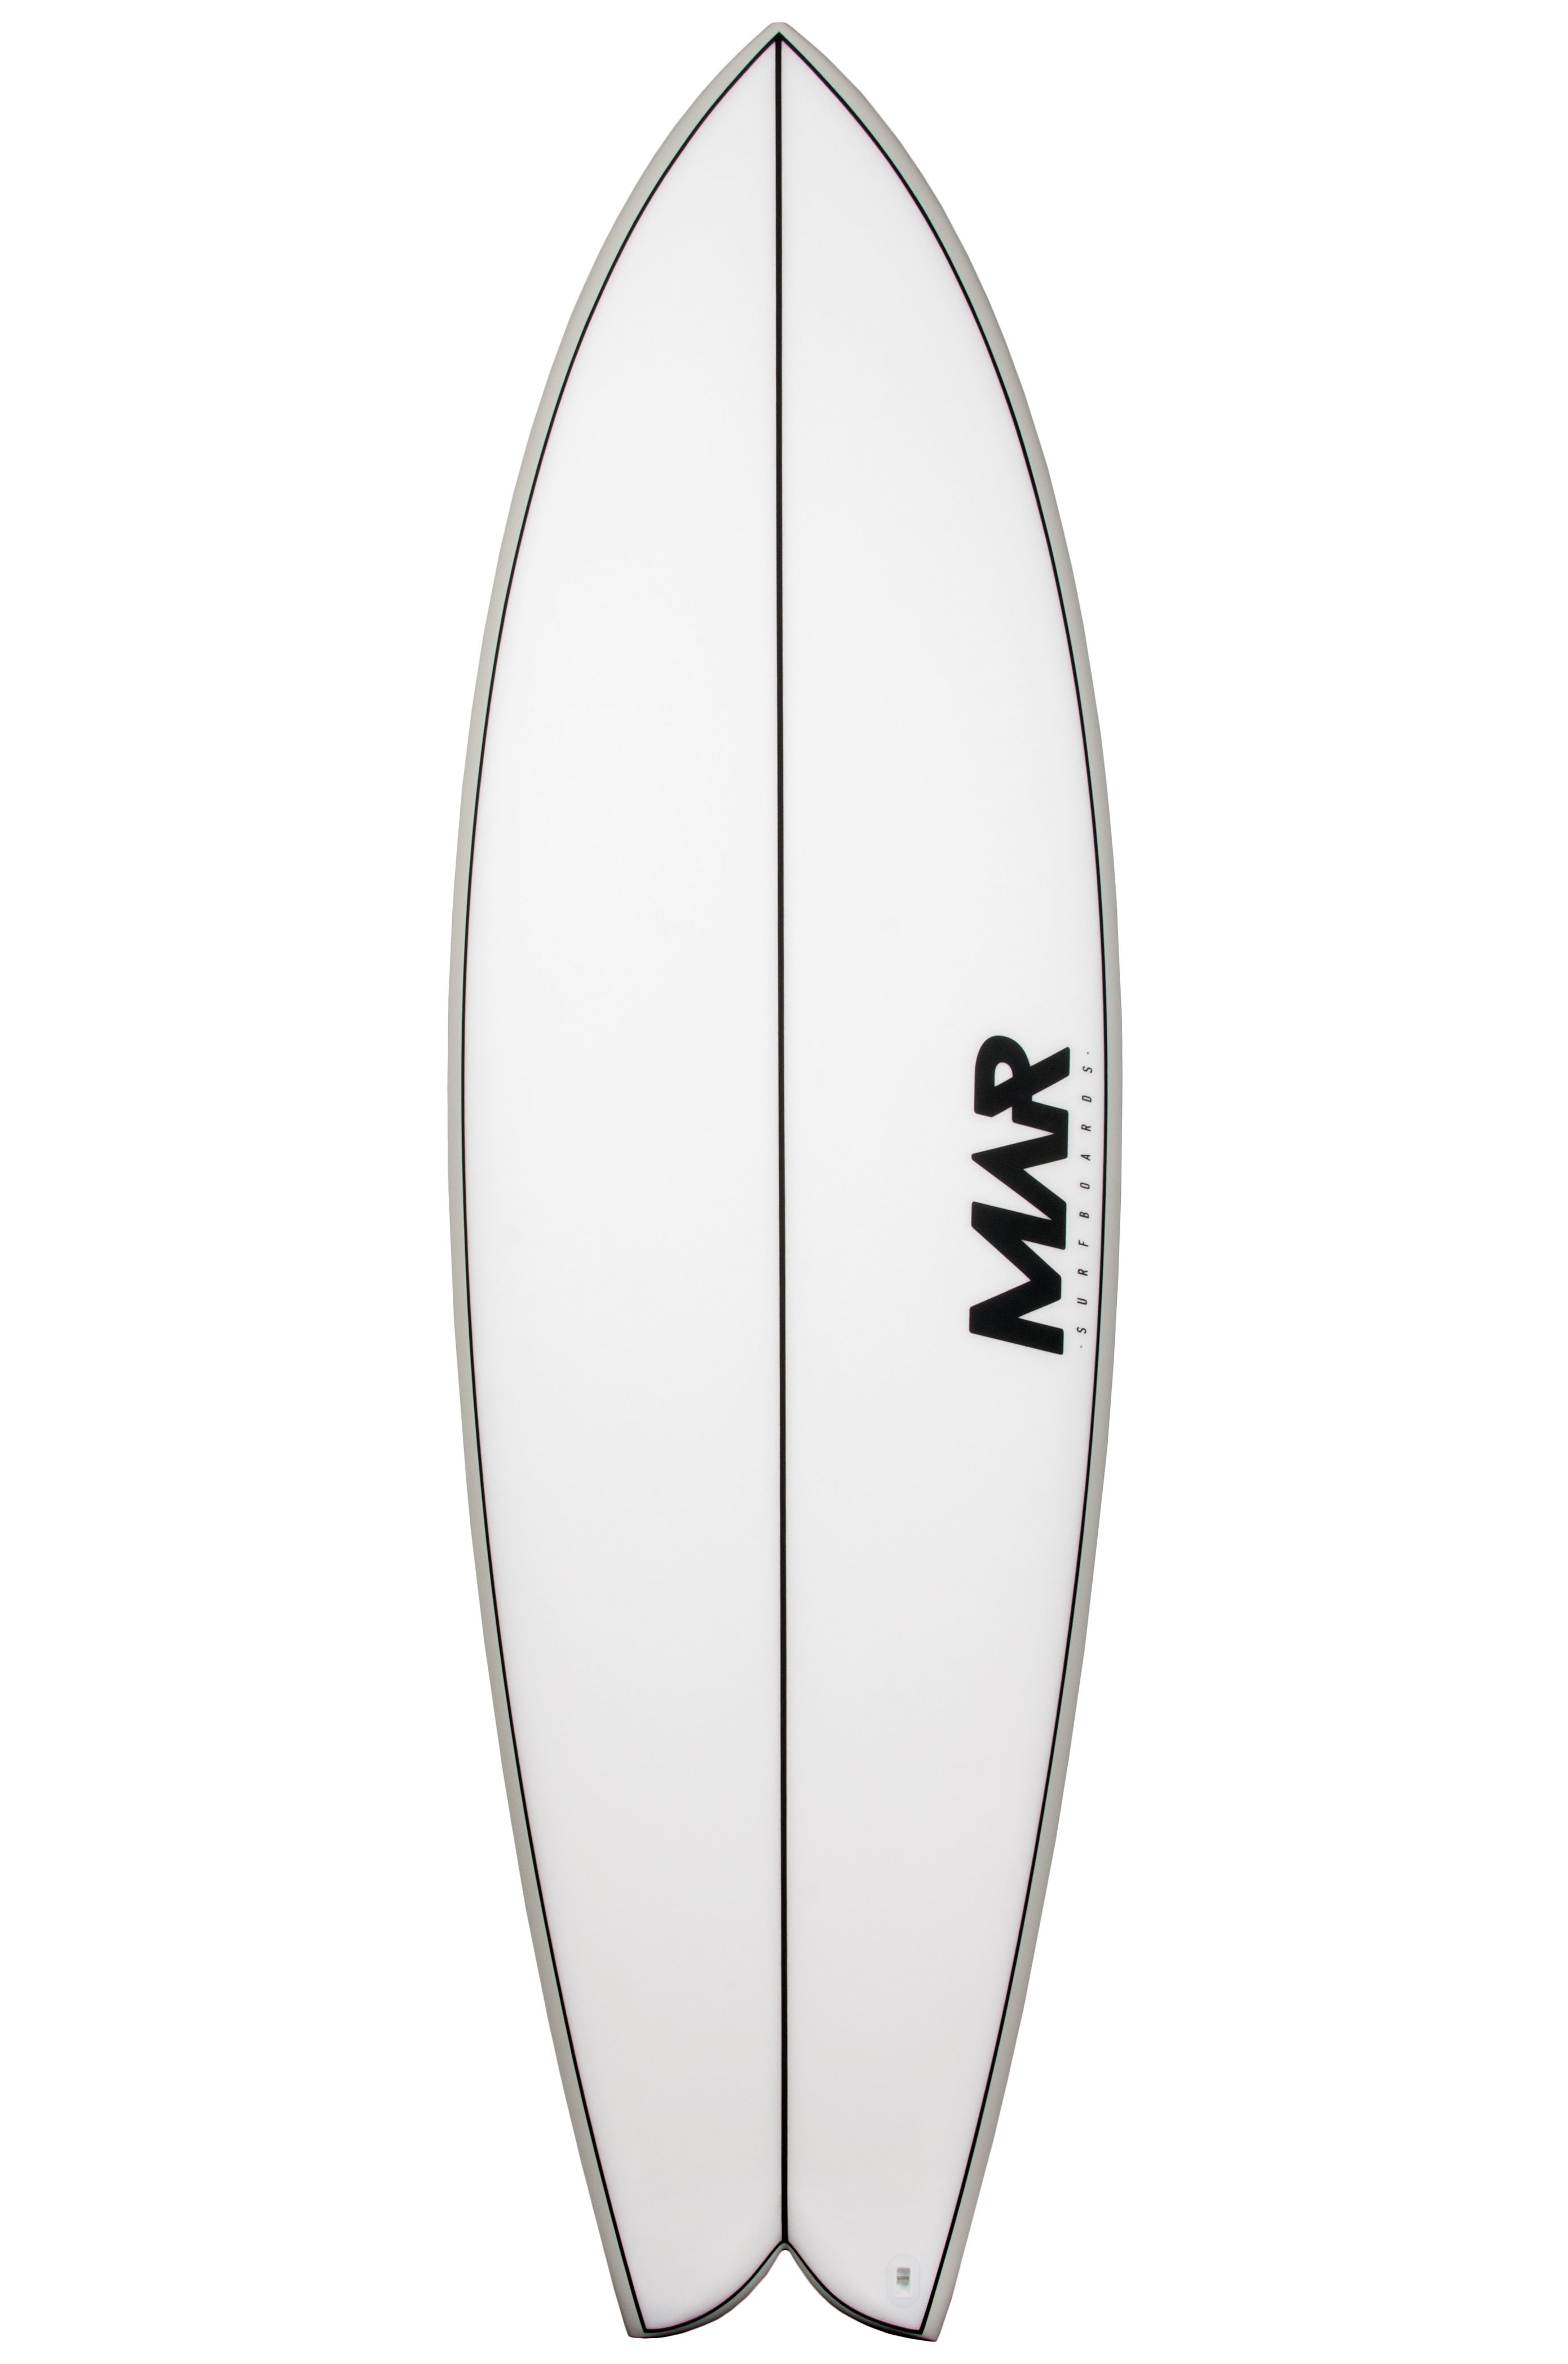 Mar Surf Board 6'2 MAR P2 XE Fish Tail - White FCS II Twin Tab 6ft2